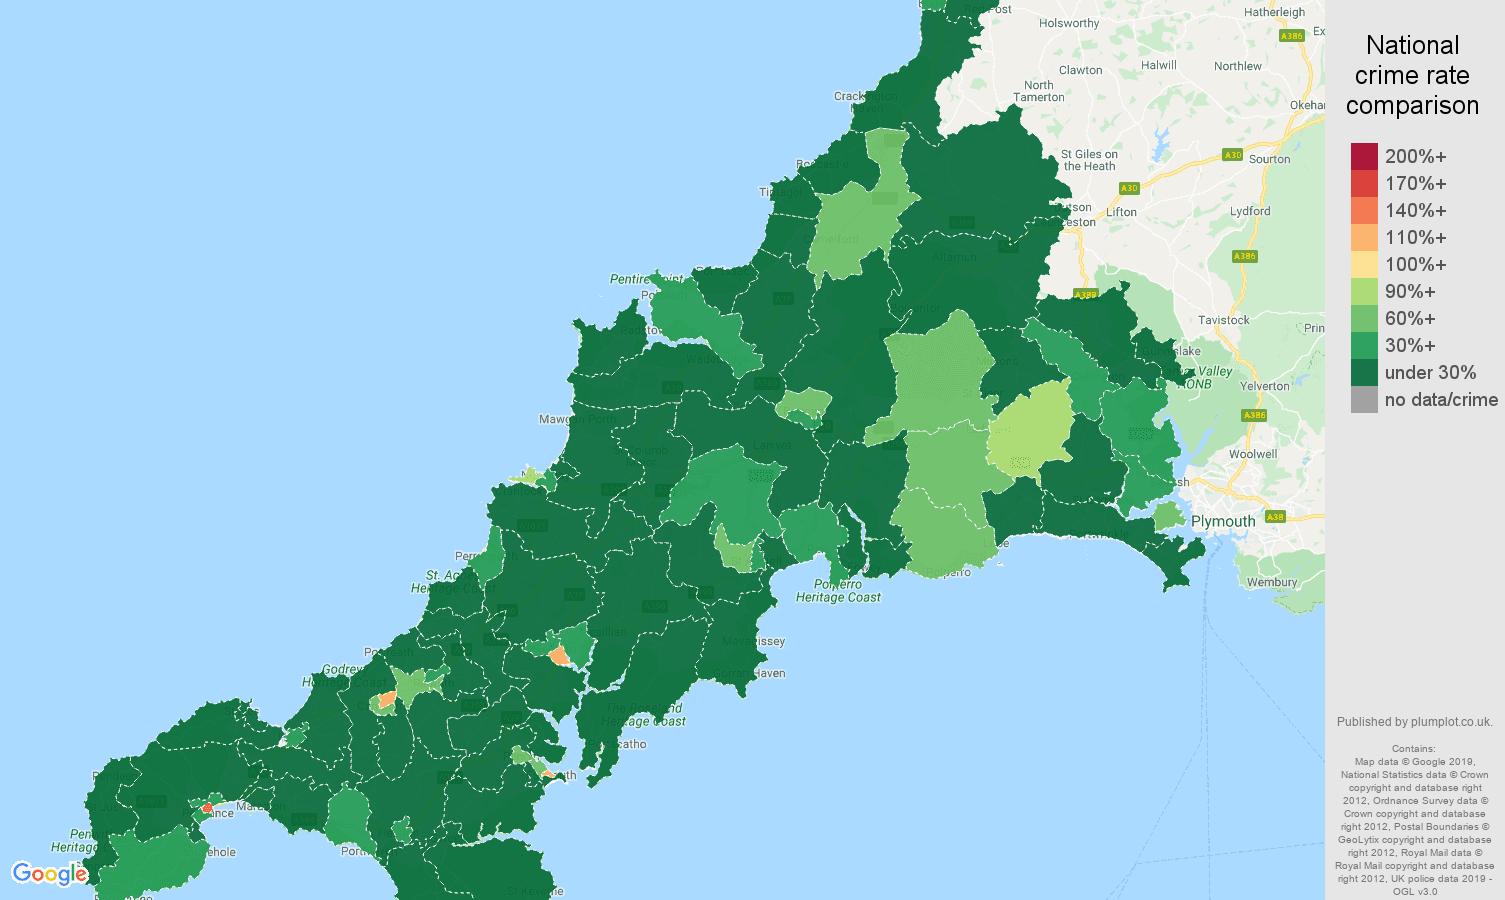 Cornwall public order crime rate comparison map